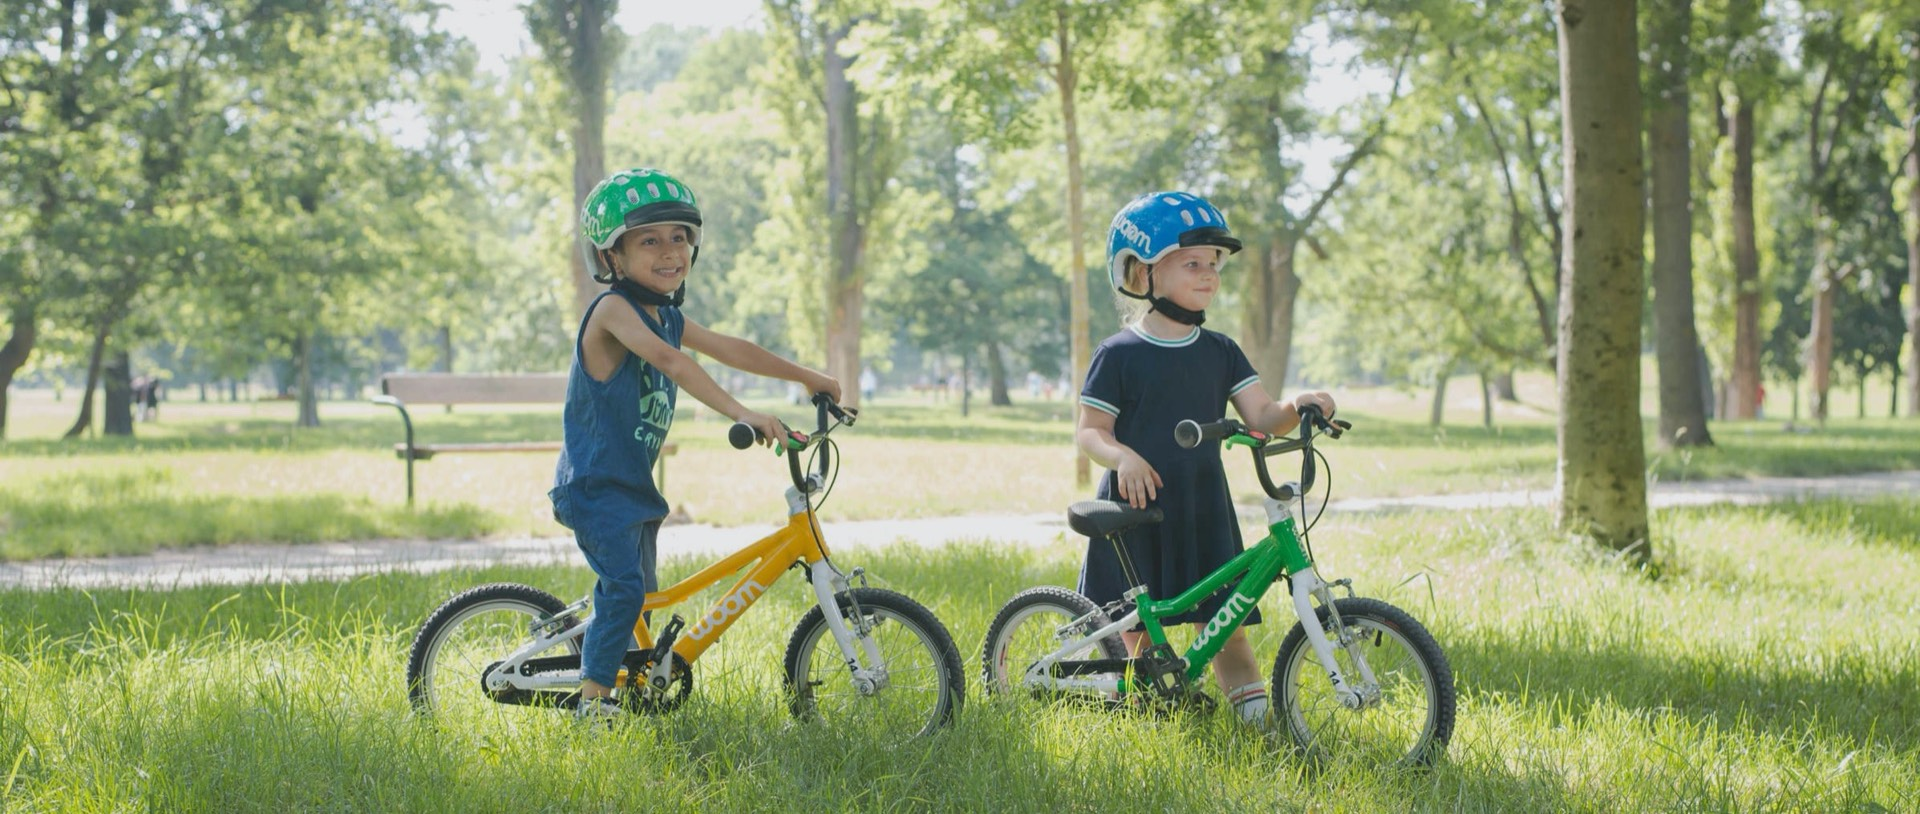 kids riding woom bikes